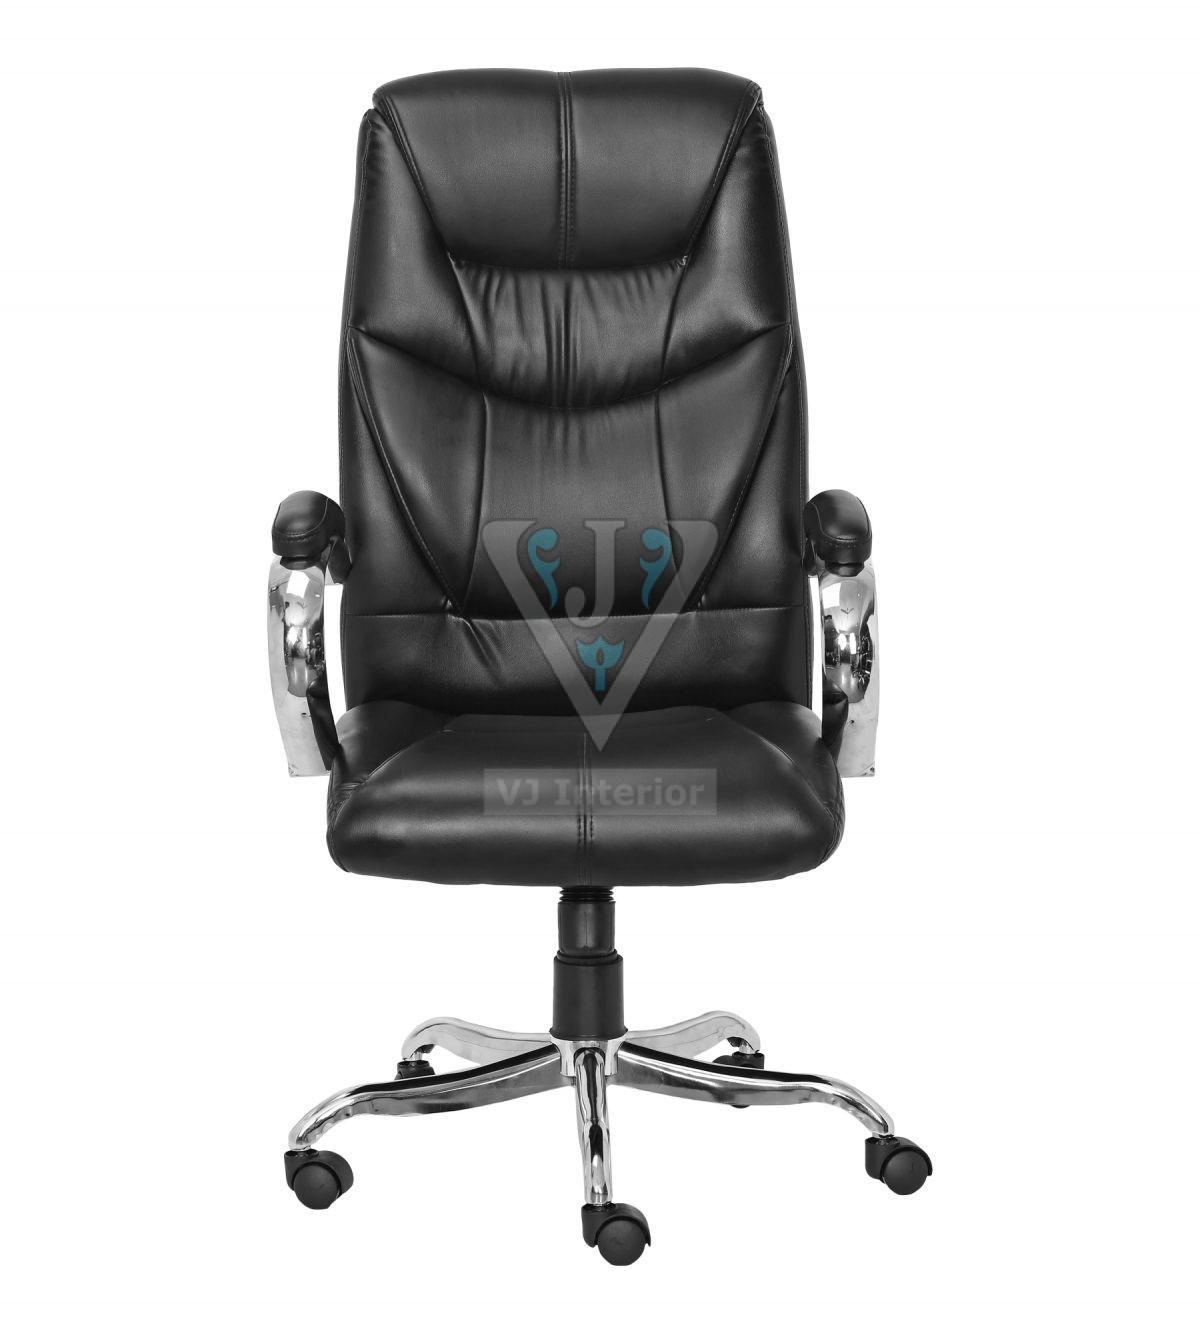 Doblepie Black Office Executive Chair High Back